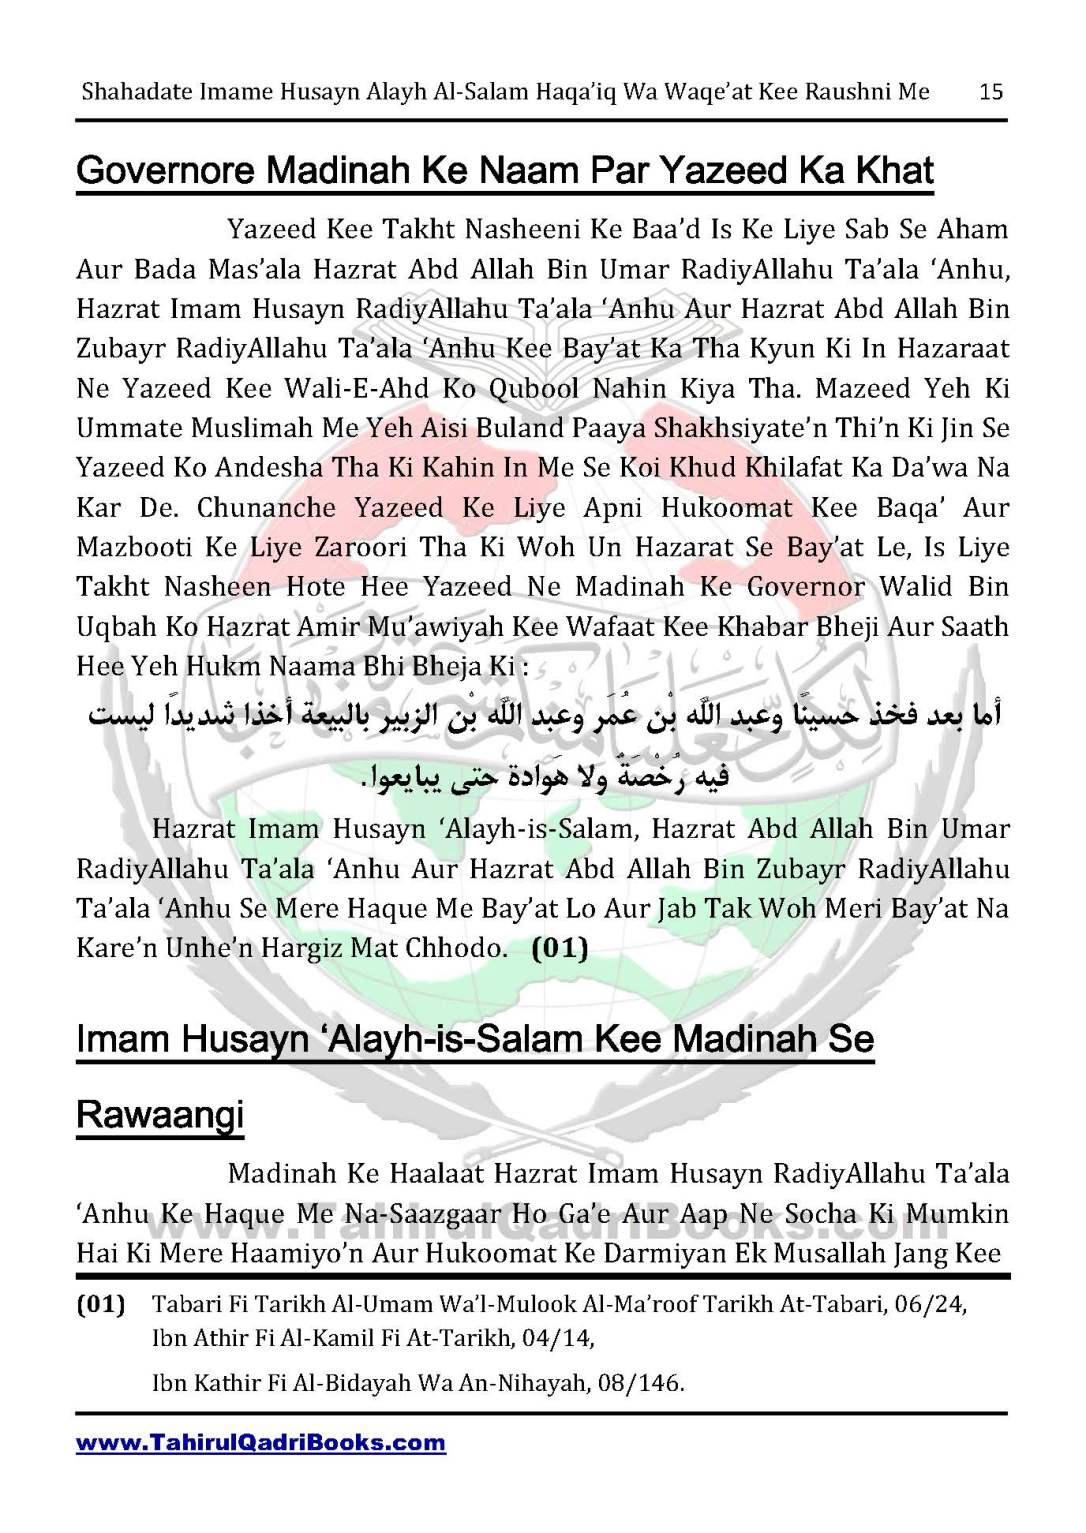 shahadate-imame-husayn-alayh-is-salam-haqaiq-wa-waqe_at-kee-raushni-me-in-roman-urdu-unlocked_Page_15